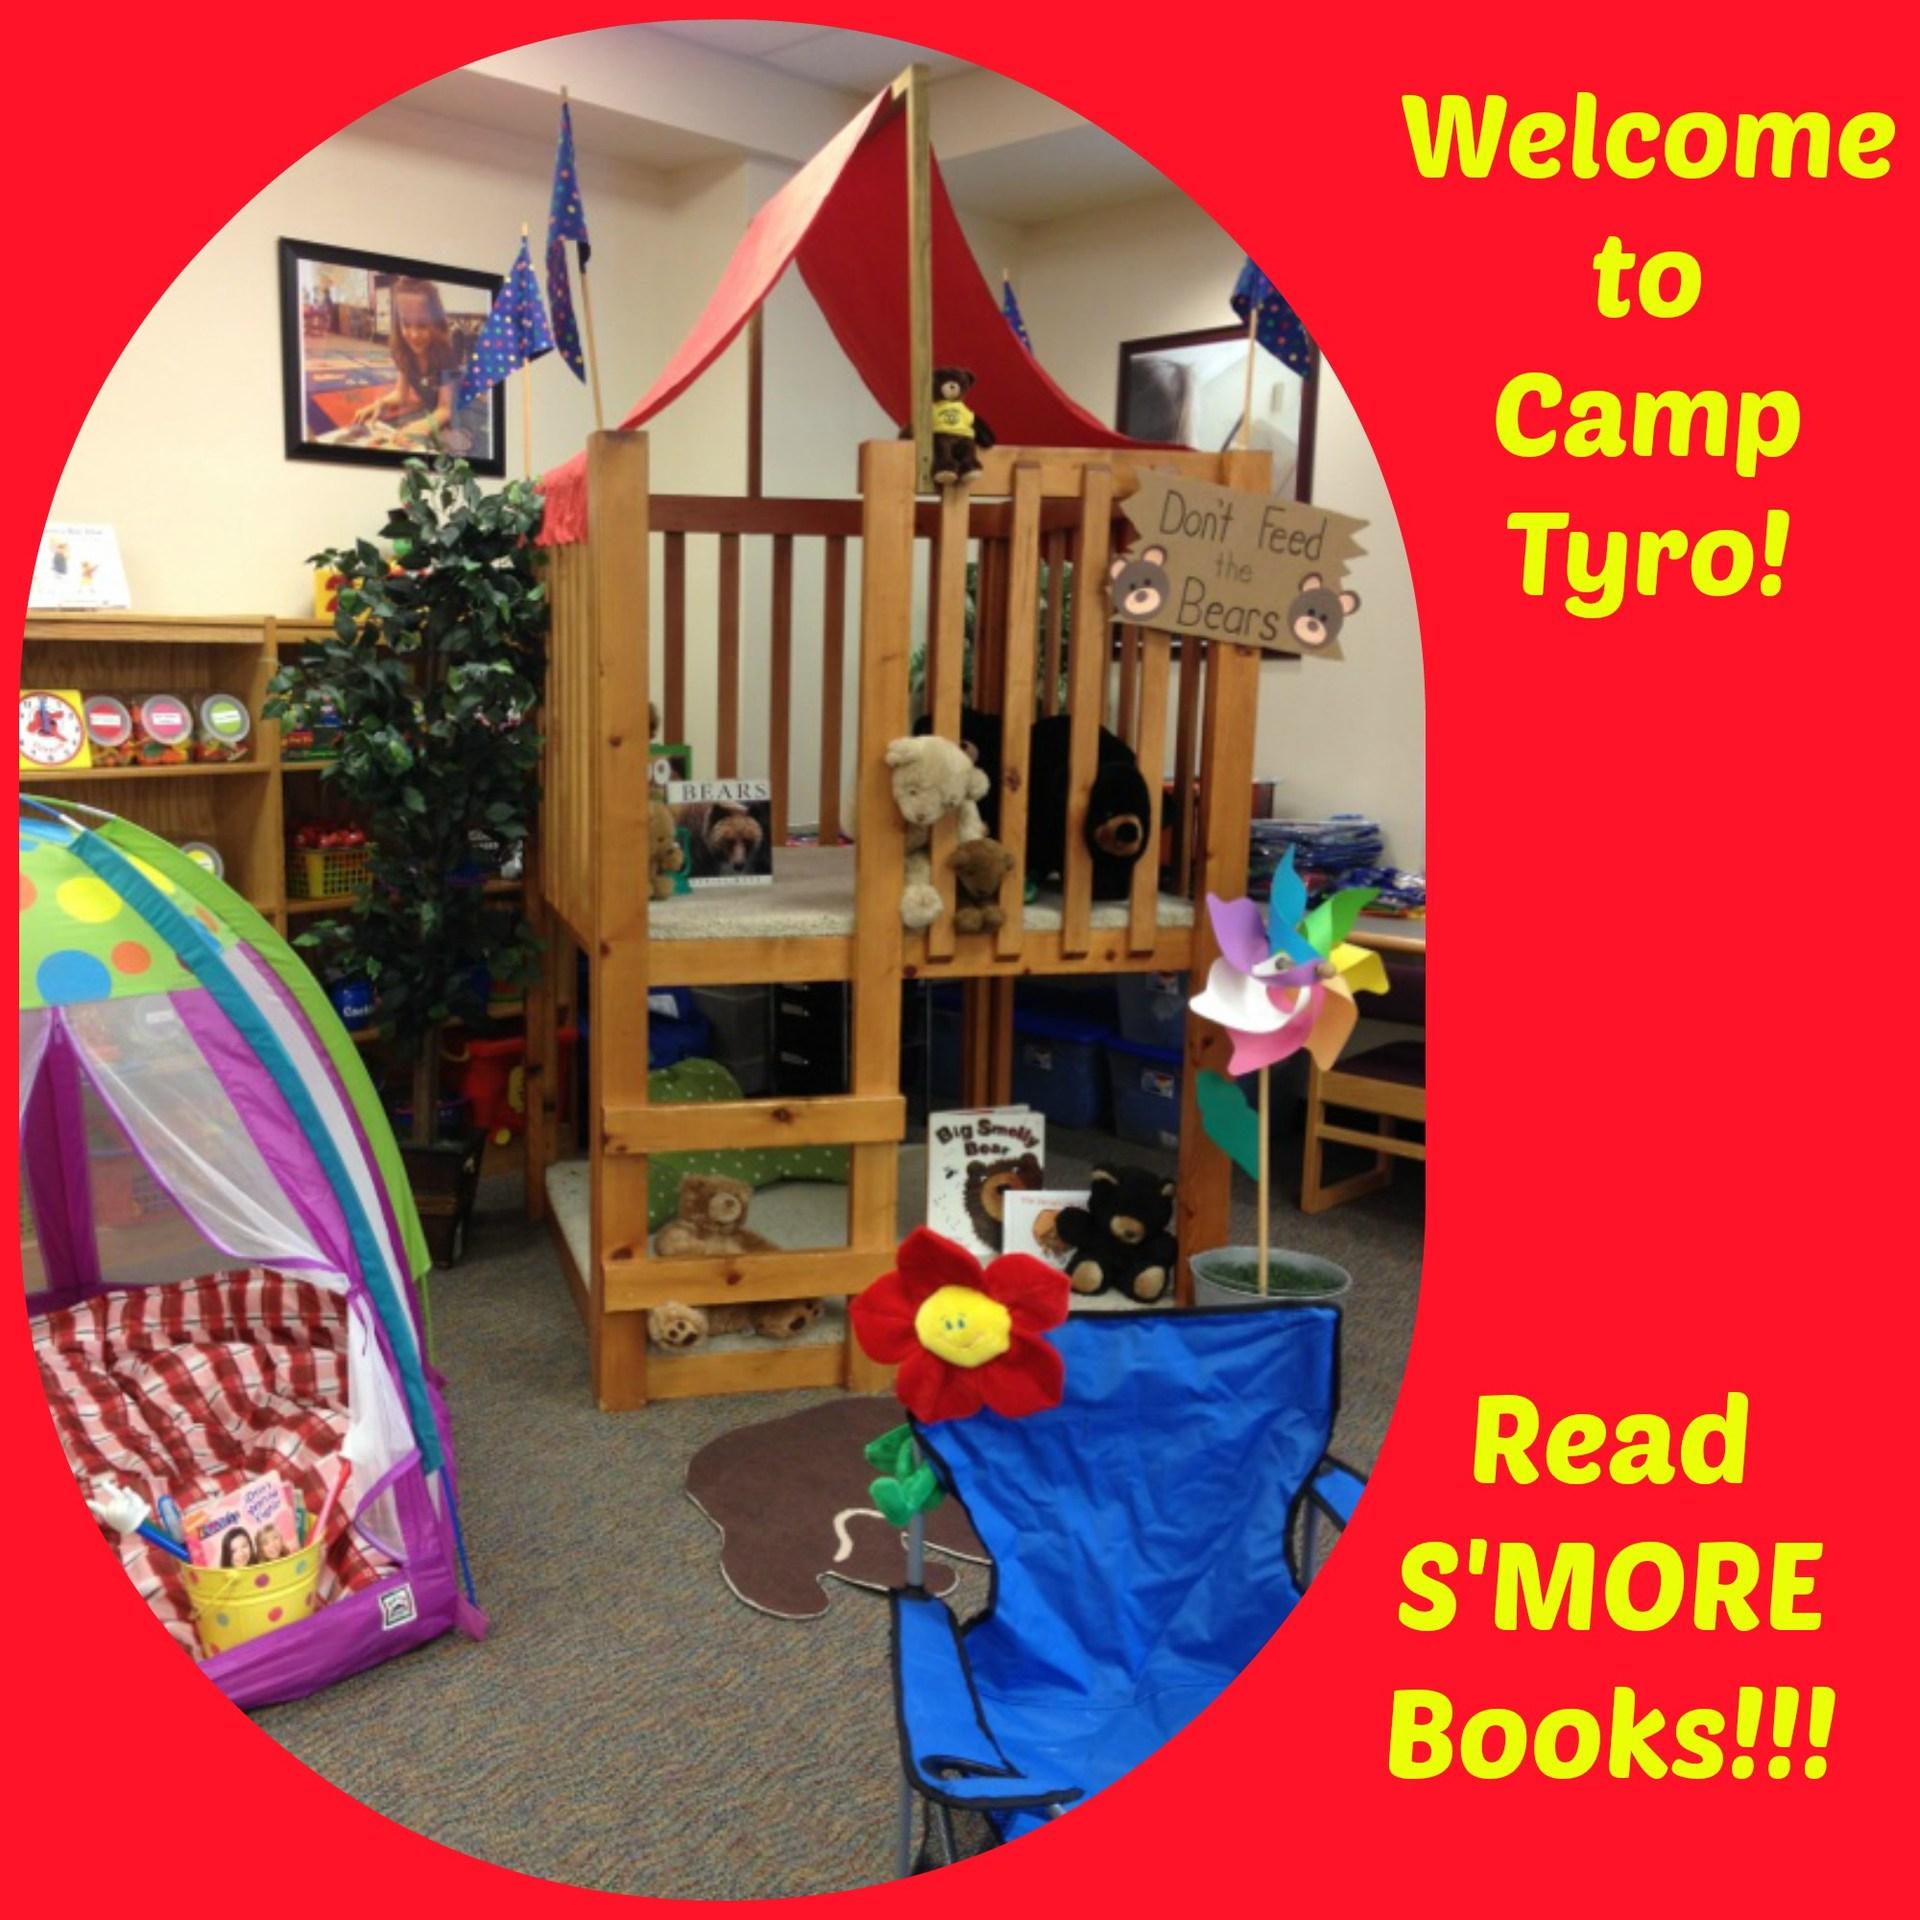 Camp Tyro